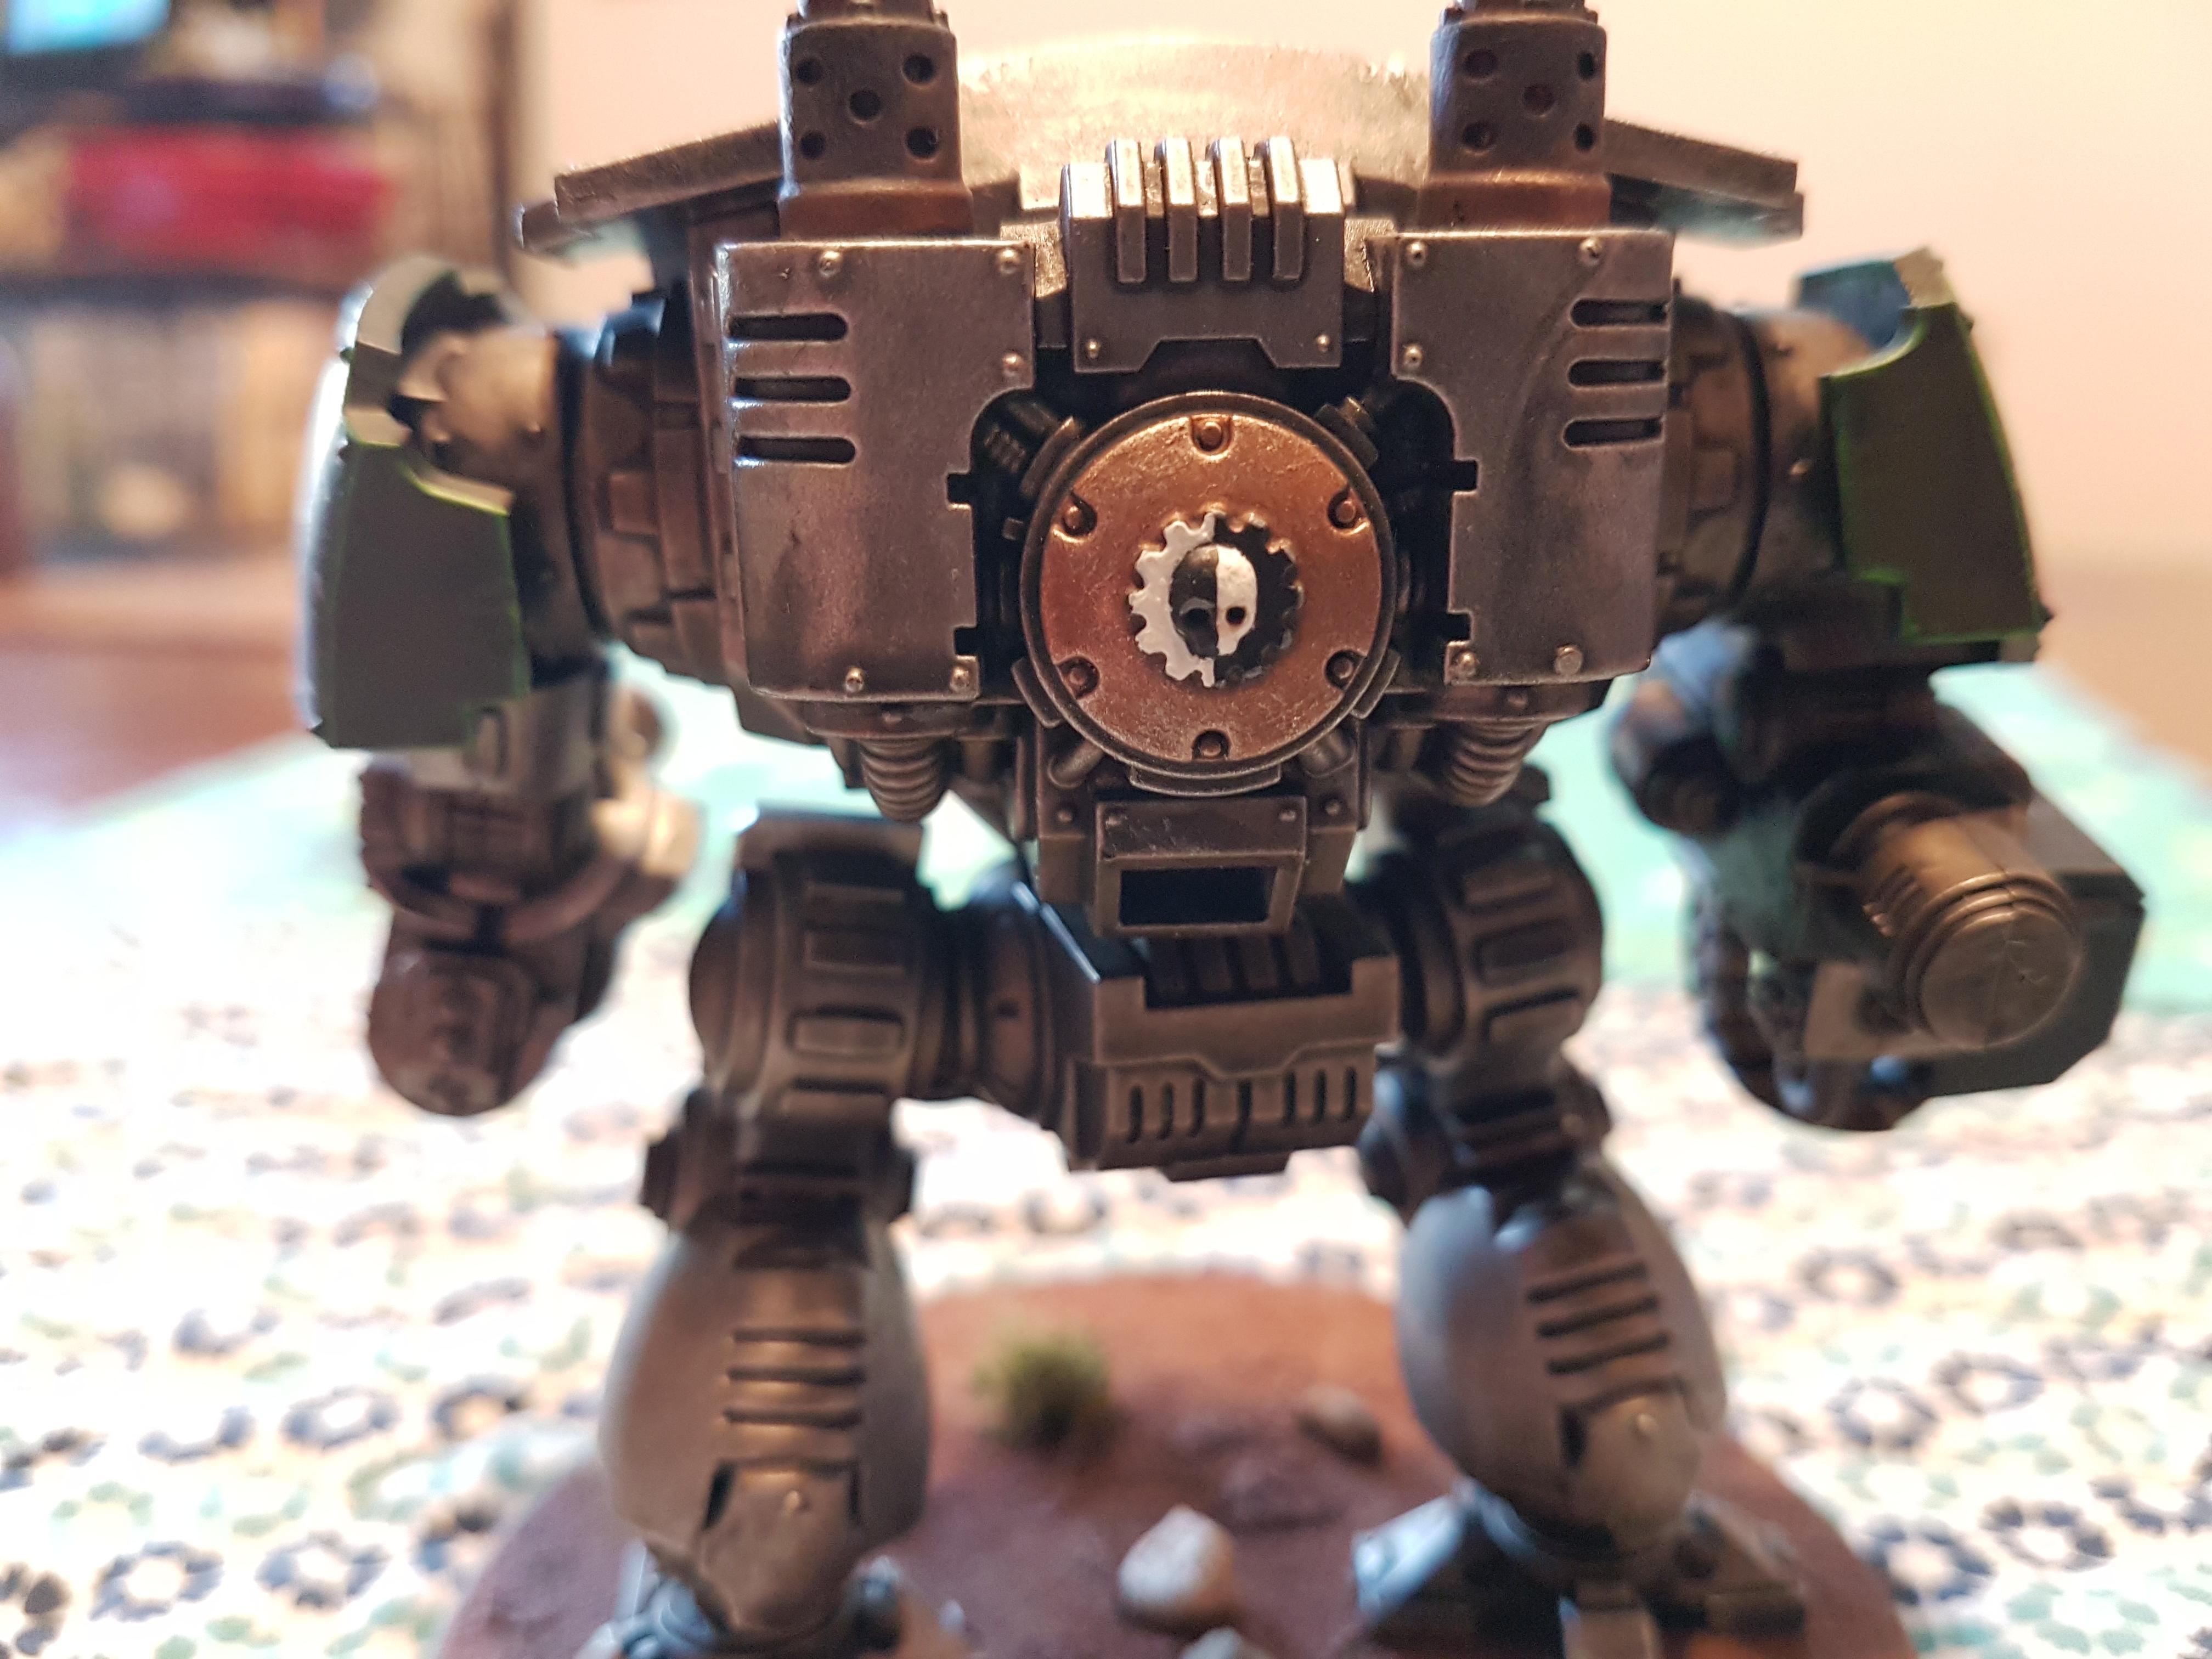 Black, Doom, Doom Legion, Dreadnought, Green, Heavy Flammer, Heavy Onslaught Catling Cannon, Iron, Legion, Metal, Primaris, Redemptor, Redemptor Dreadnought, Redmptor Fist, Silver, Space Marines